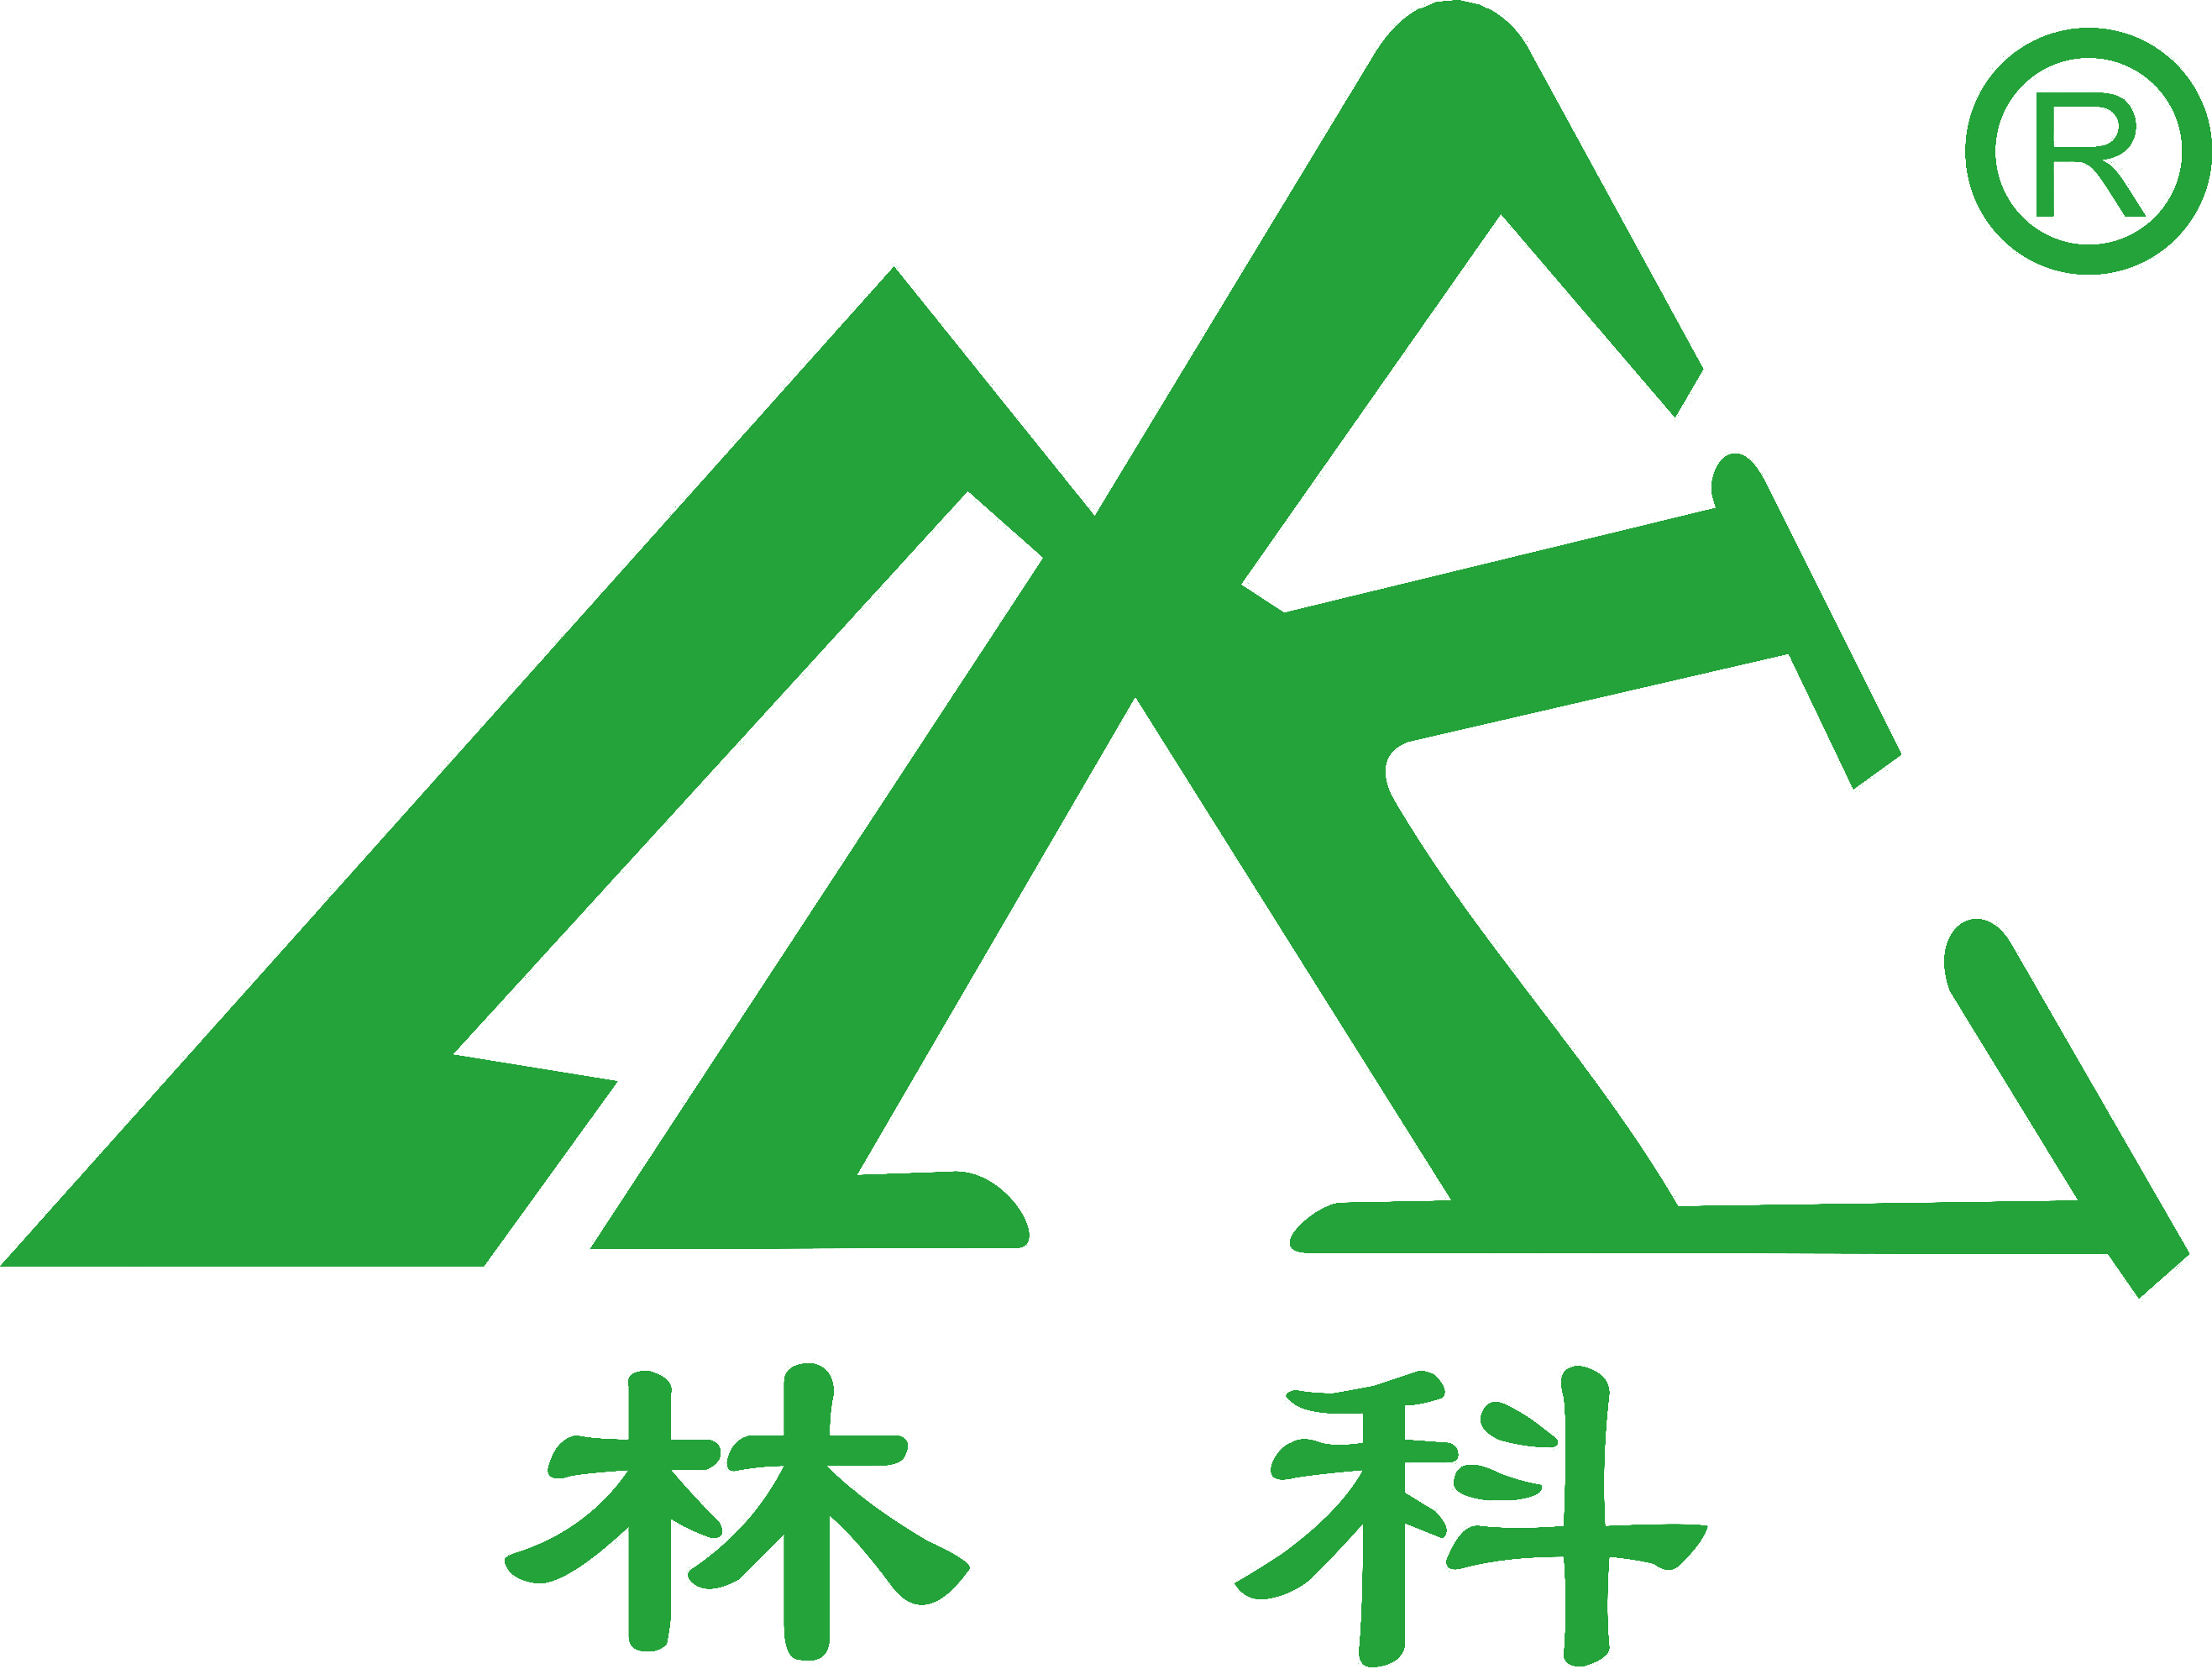 http://manual.pchi-china.com/highset/file/view/264510660442853378